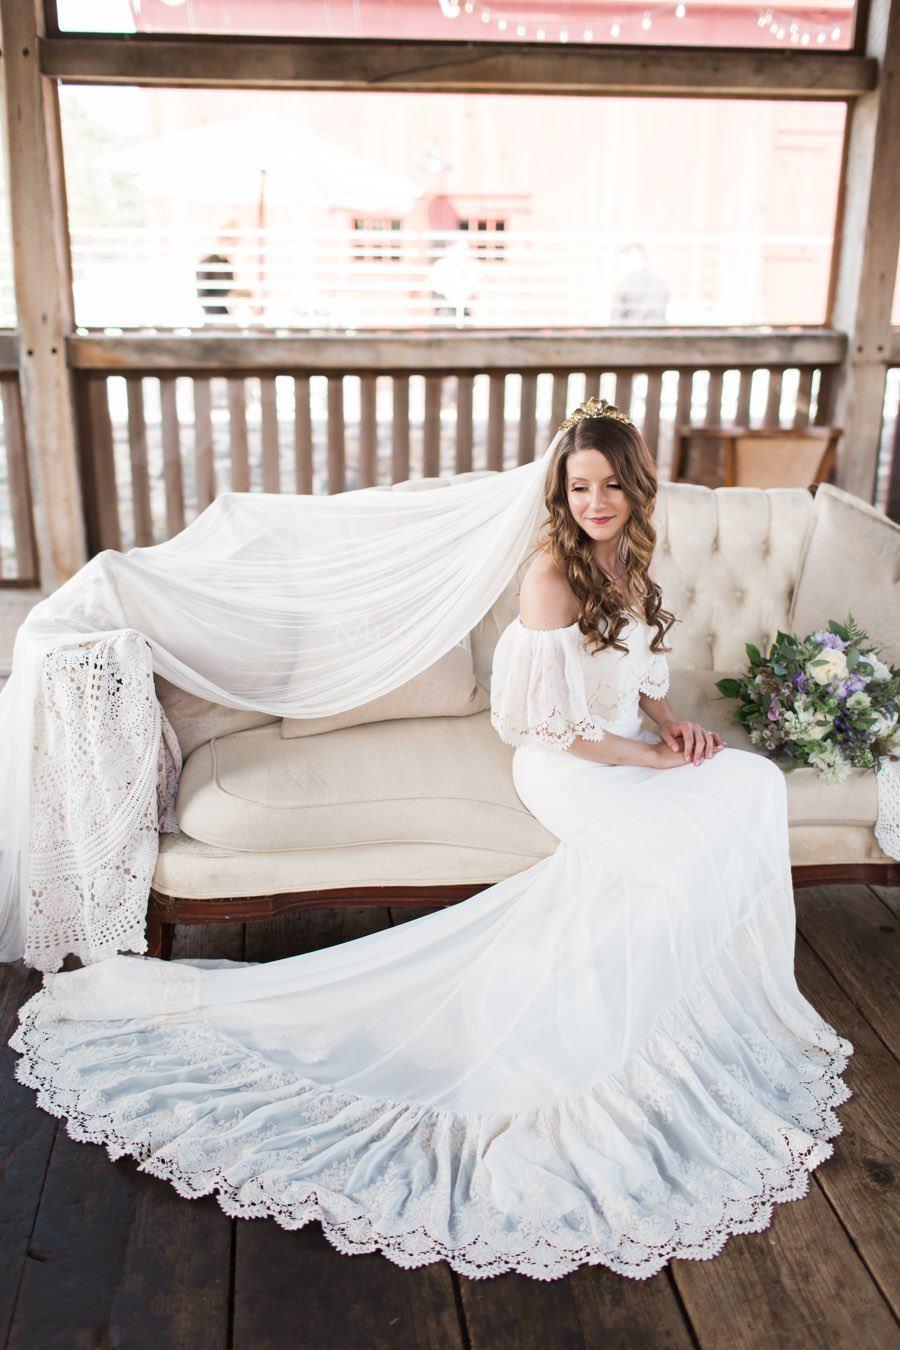 rustic wedding dress with veil